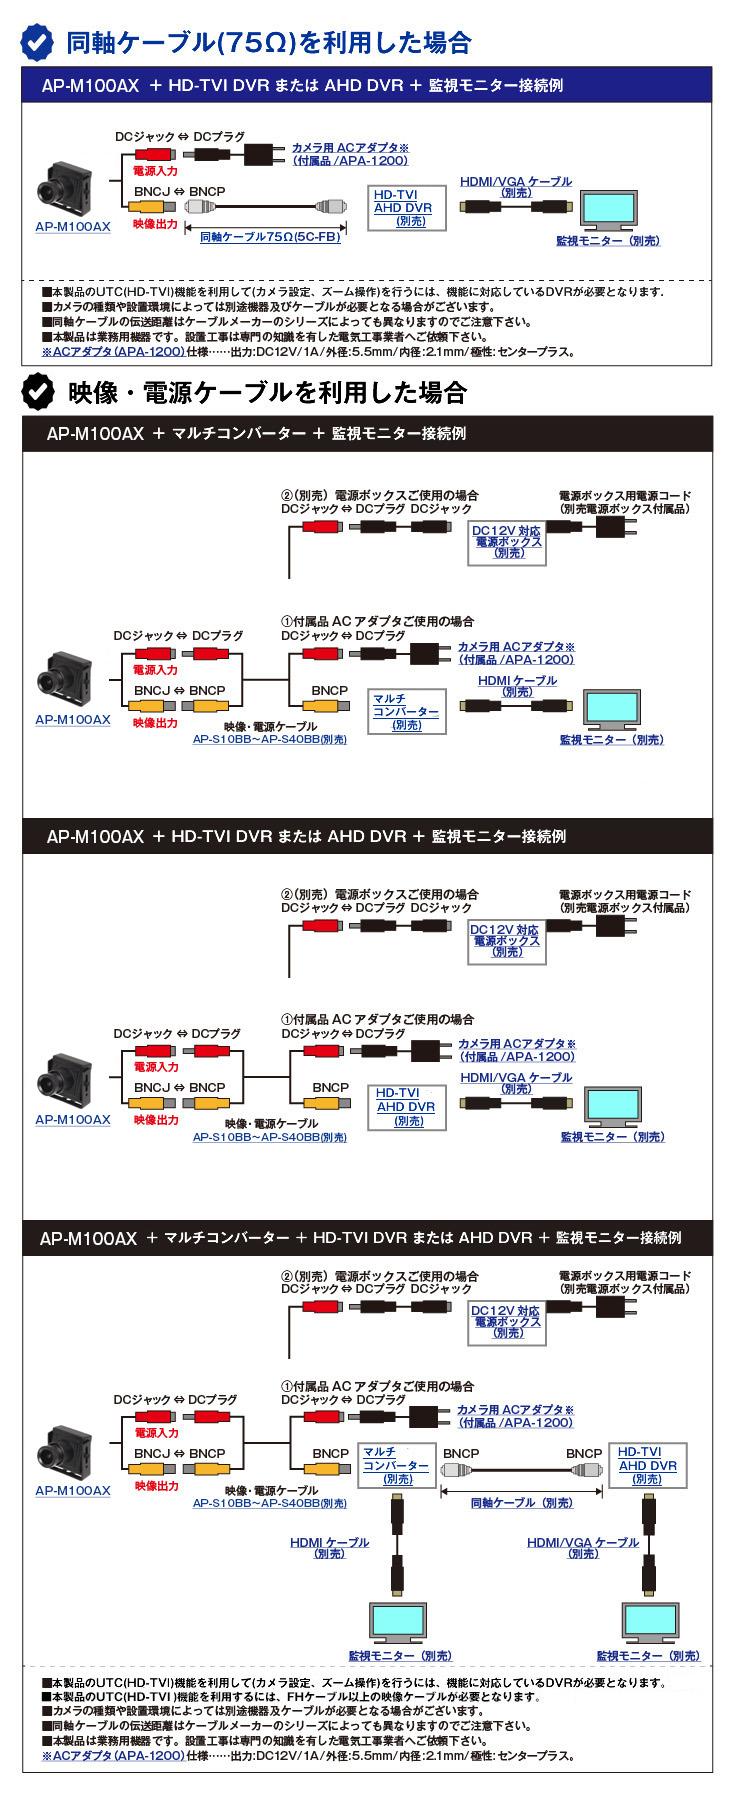 AHD 200万画素小型防犯カメラ(AP-M100AX)